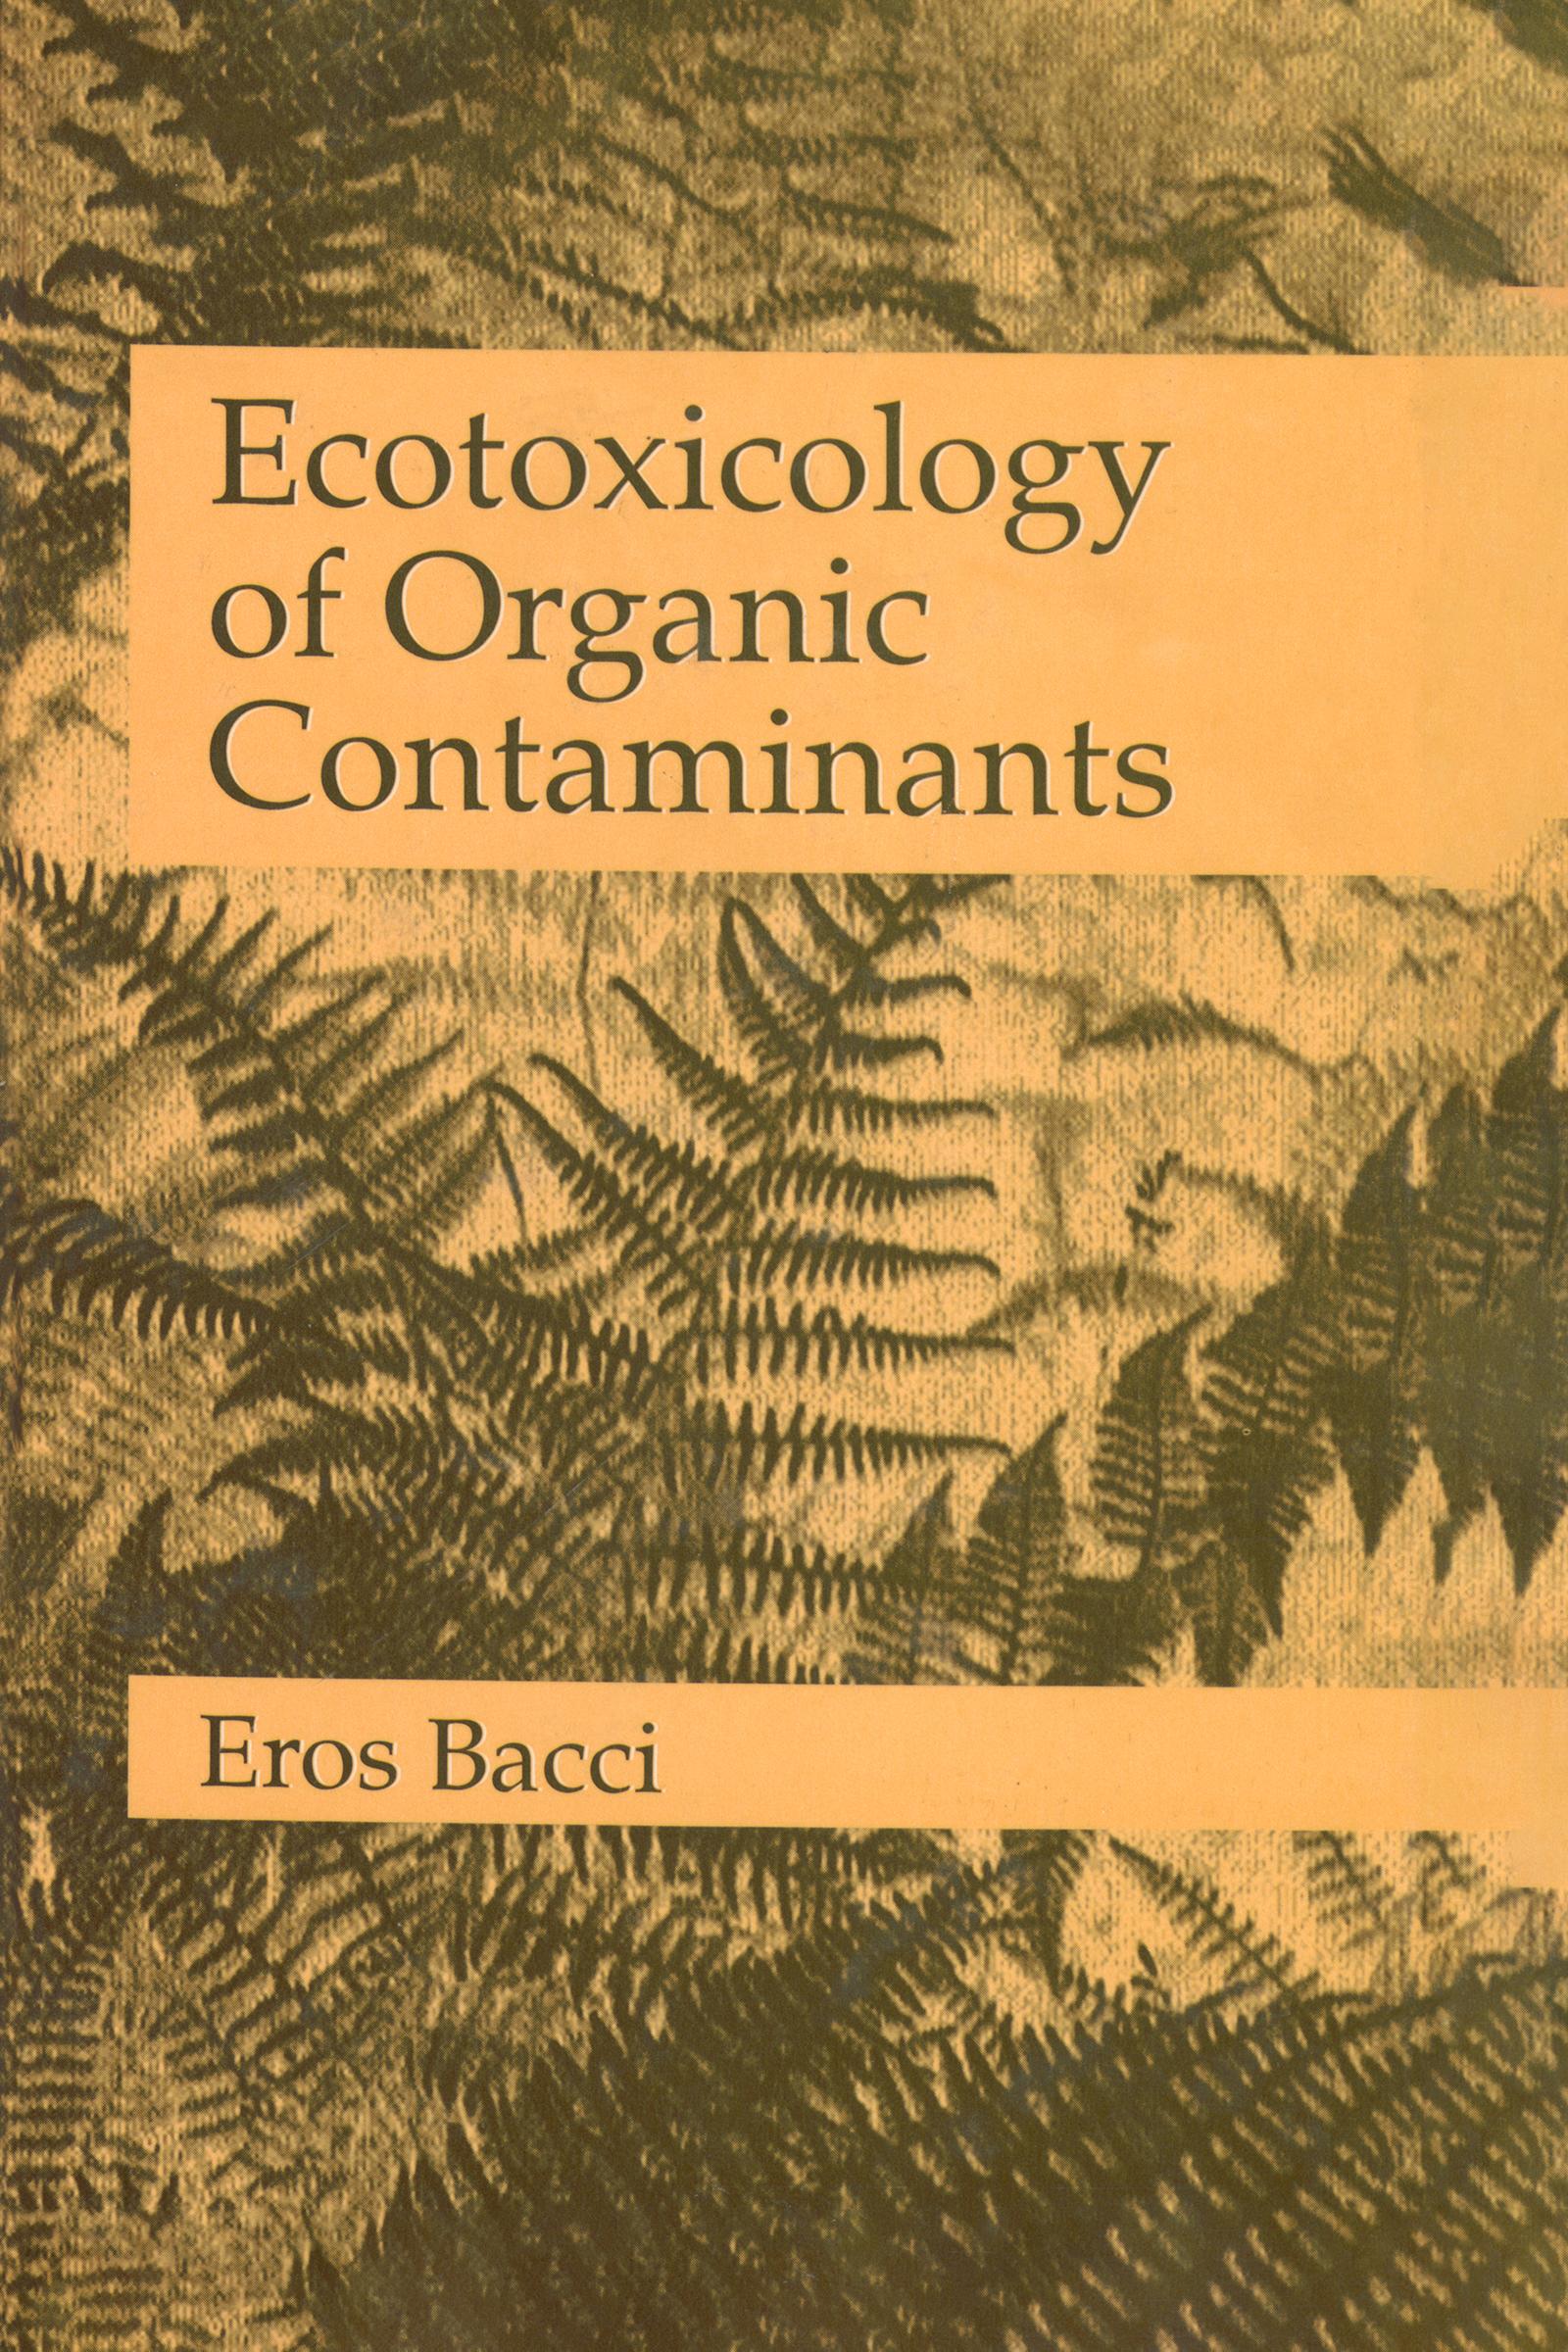 Ecotoxicology of Organic Contaminants: 1st Edition (Hardback) book cover